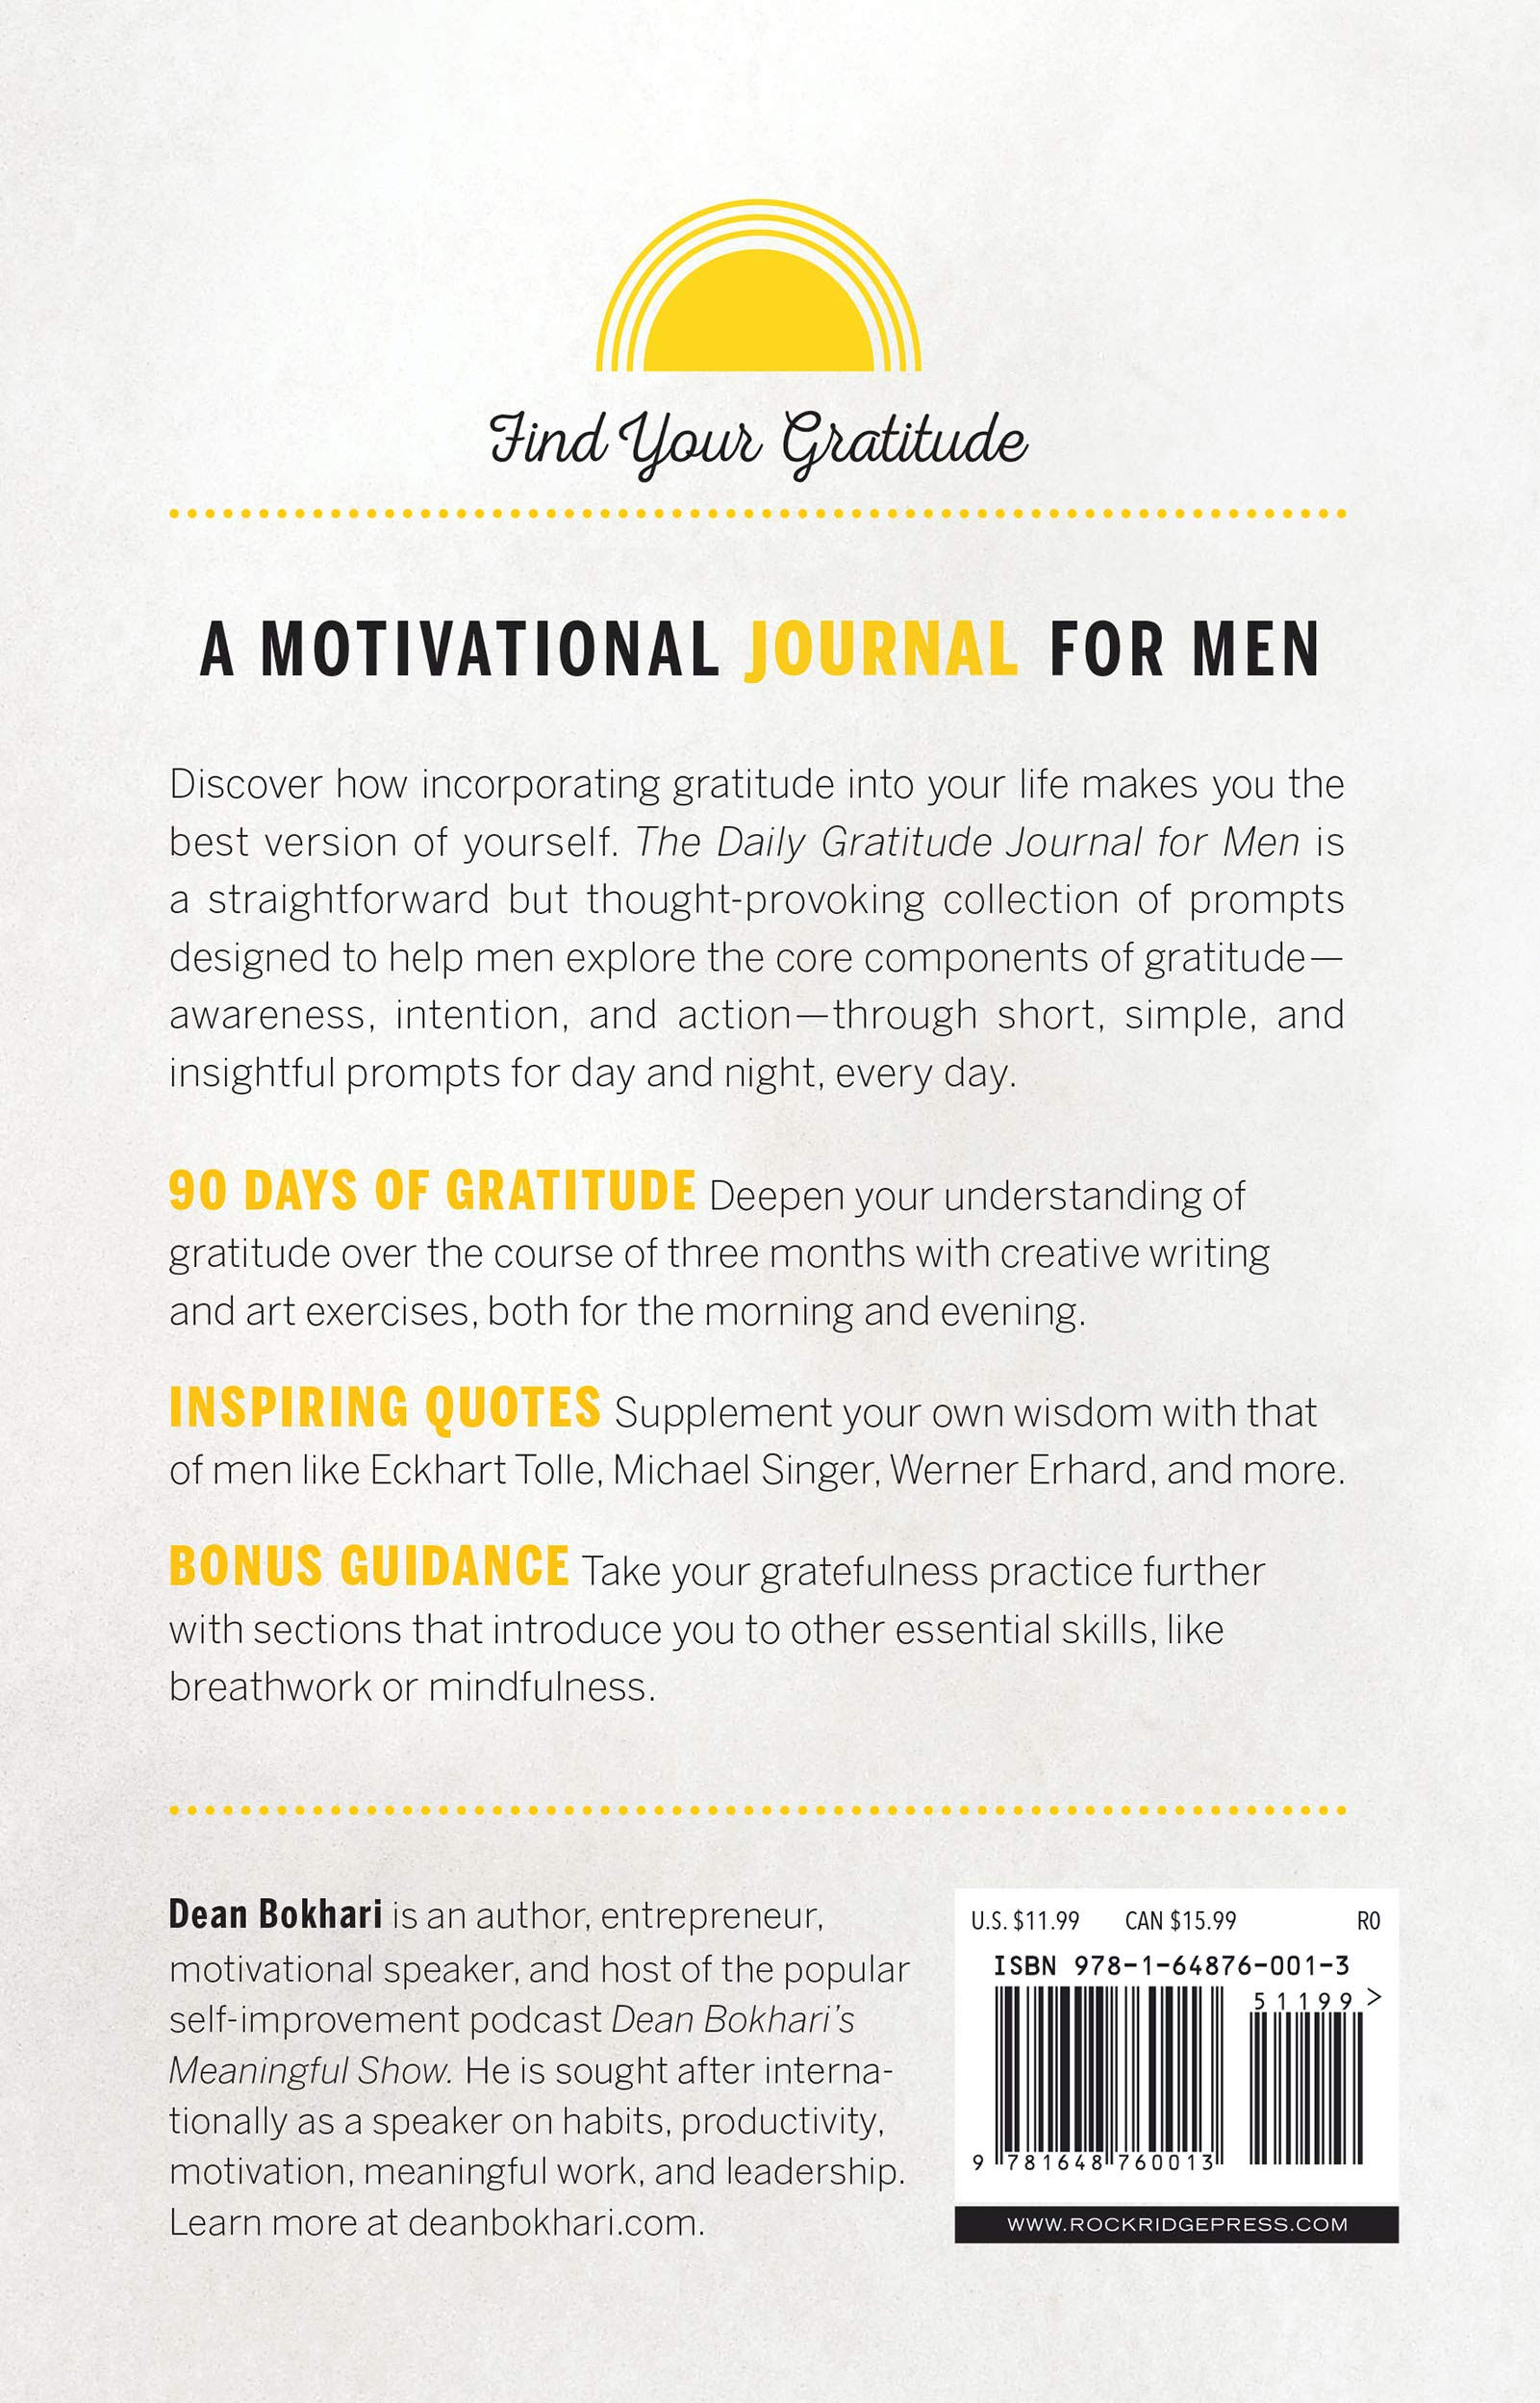 The_Daily_Gratitude_Journal_for_Men_by_Dean_Bokhari